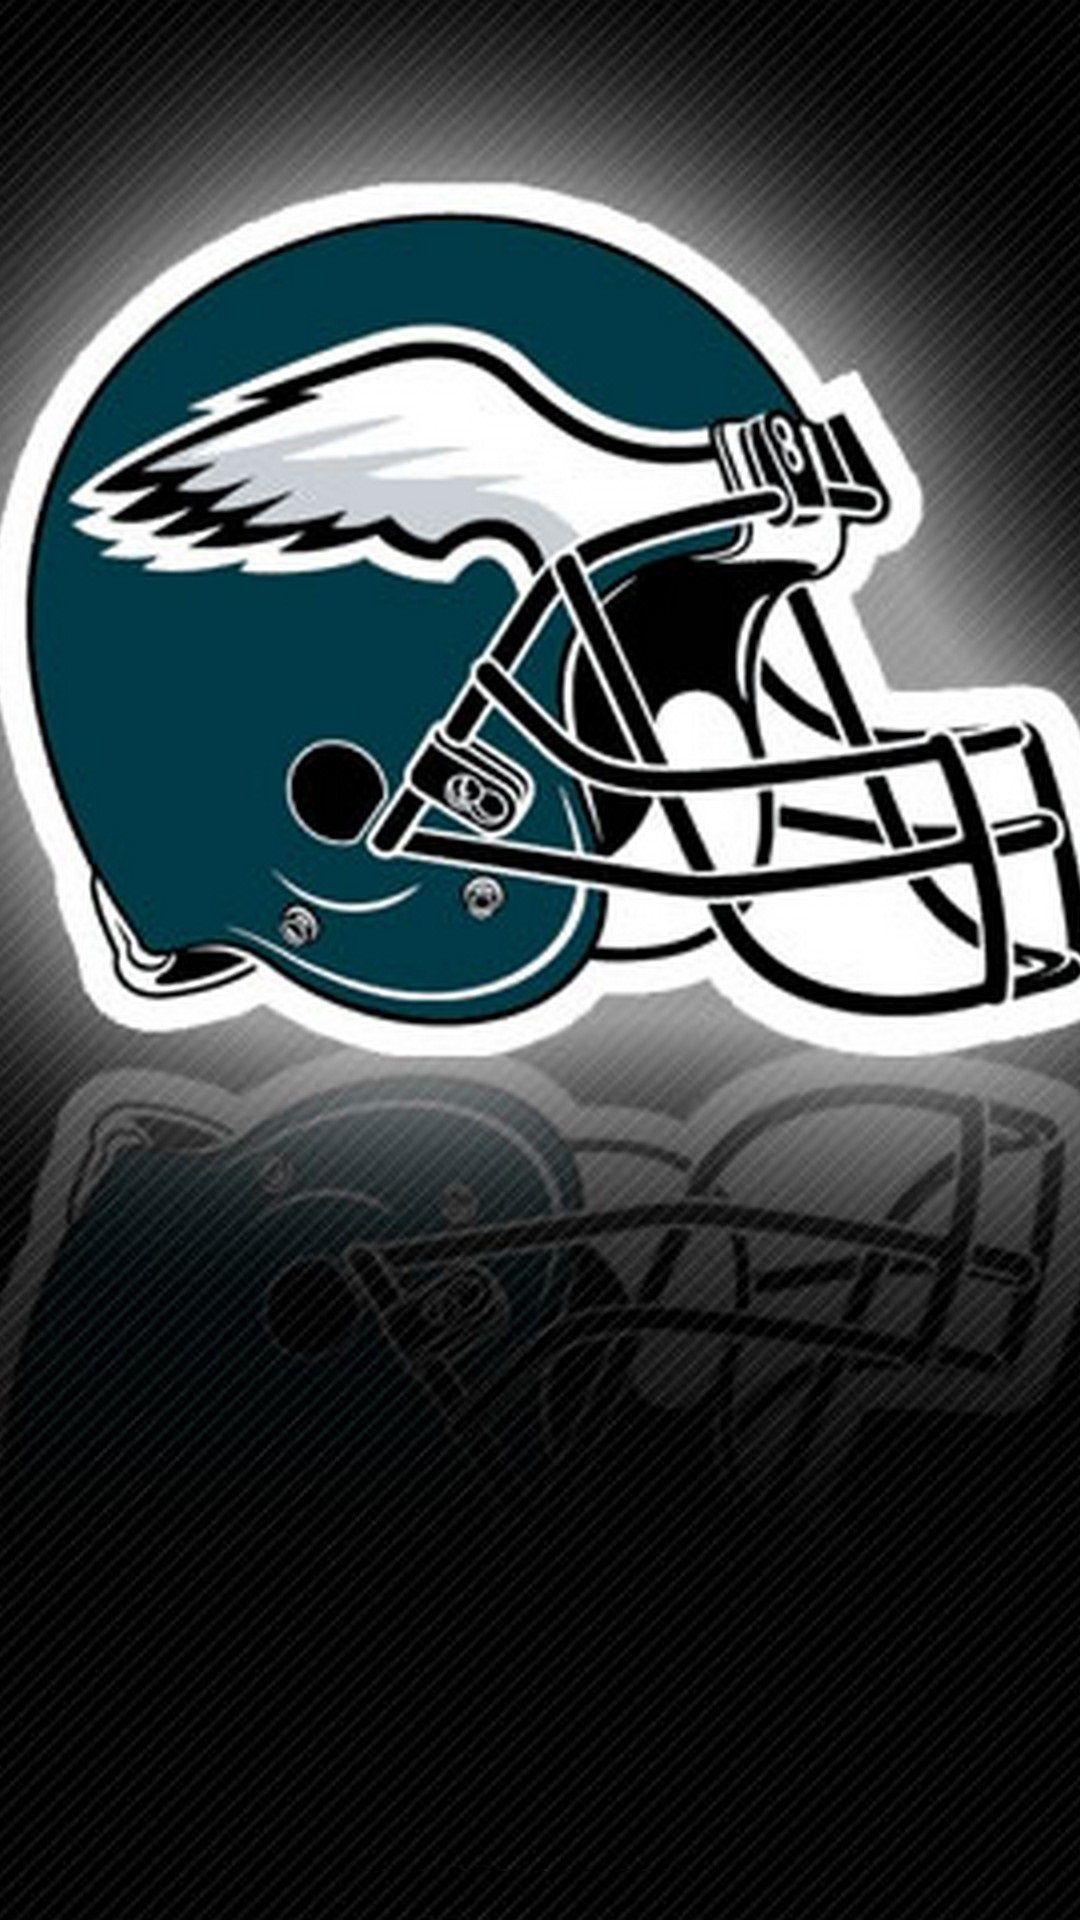 iPhone Wallpaper HD NFL Eagles Minnesota vikings logo